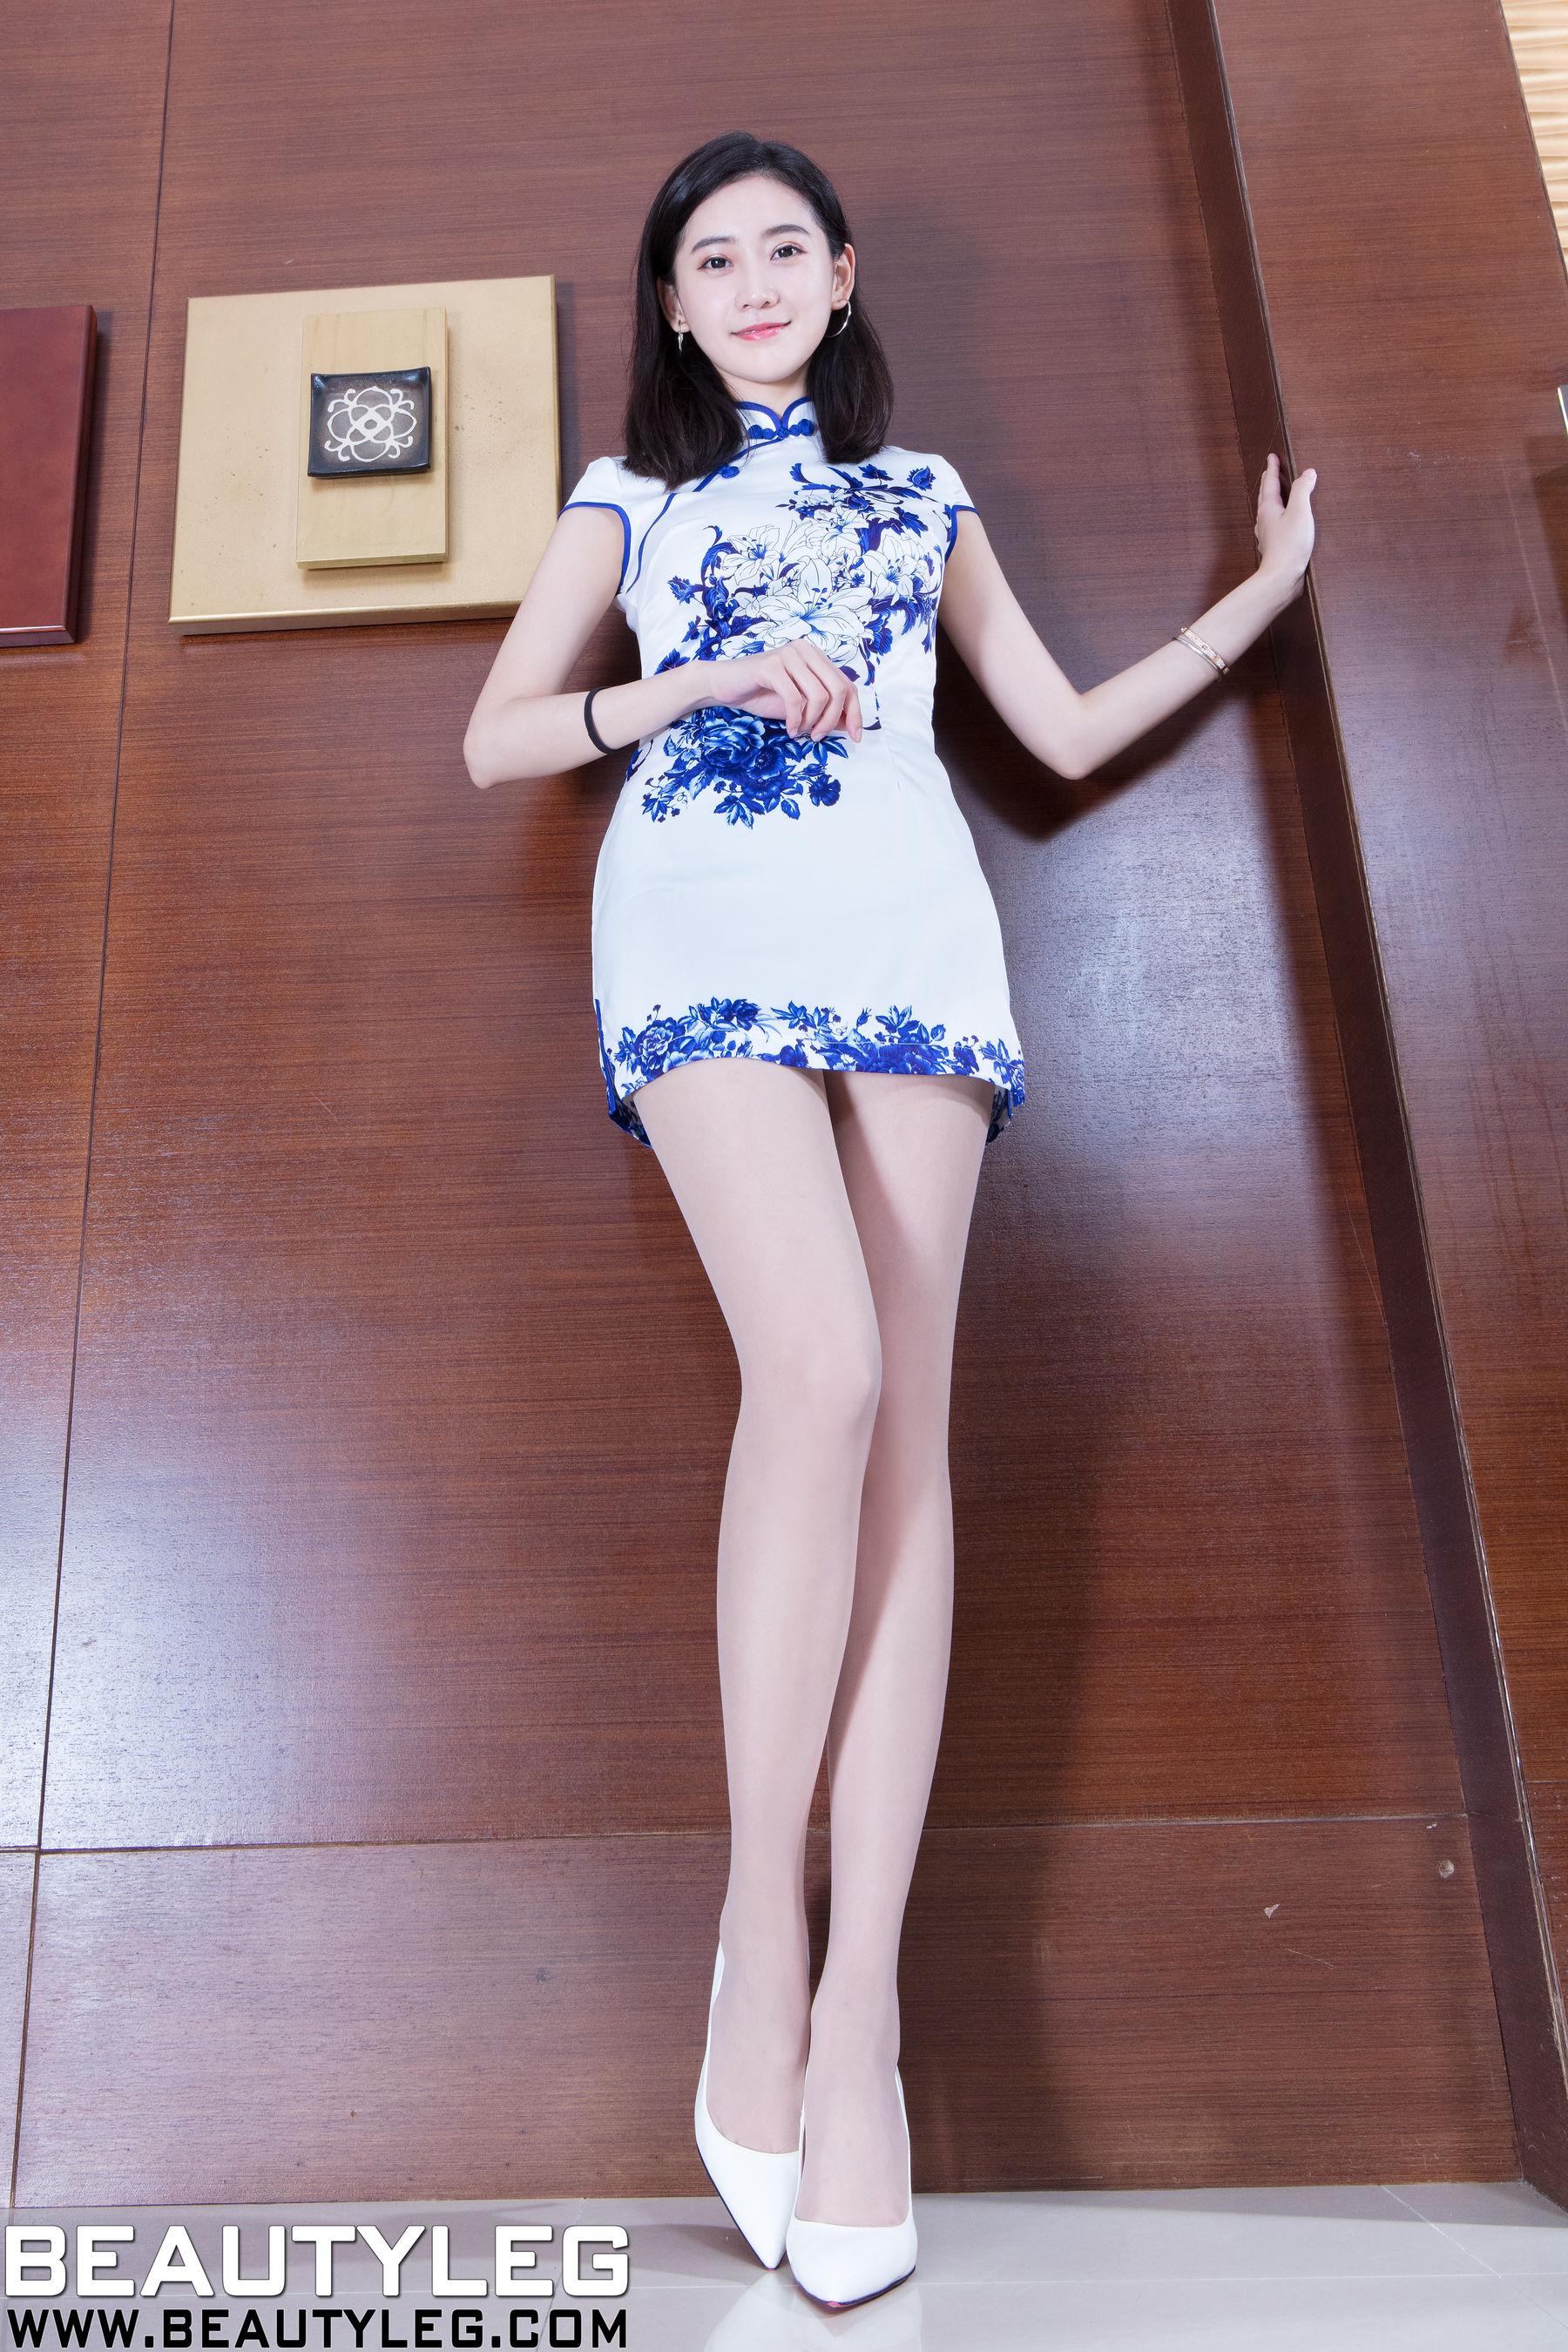 VOL.712 [Beautyleg]高跟美腿:腿模Leonie超高清个人性感漂亮大图(48P)